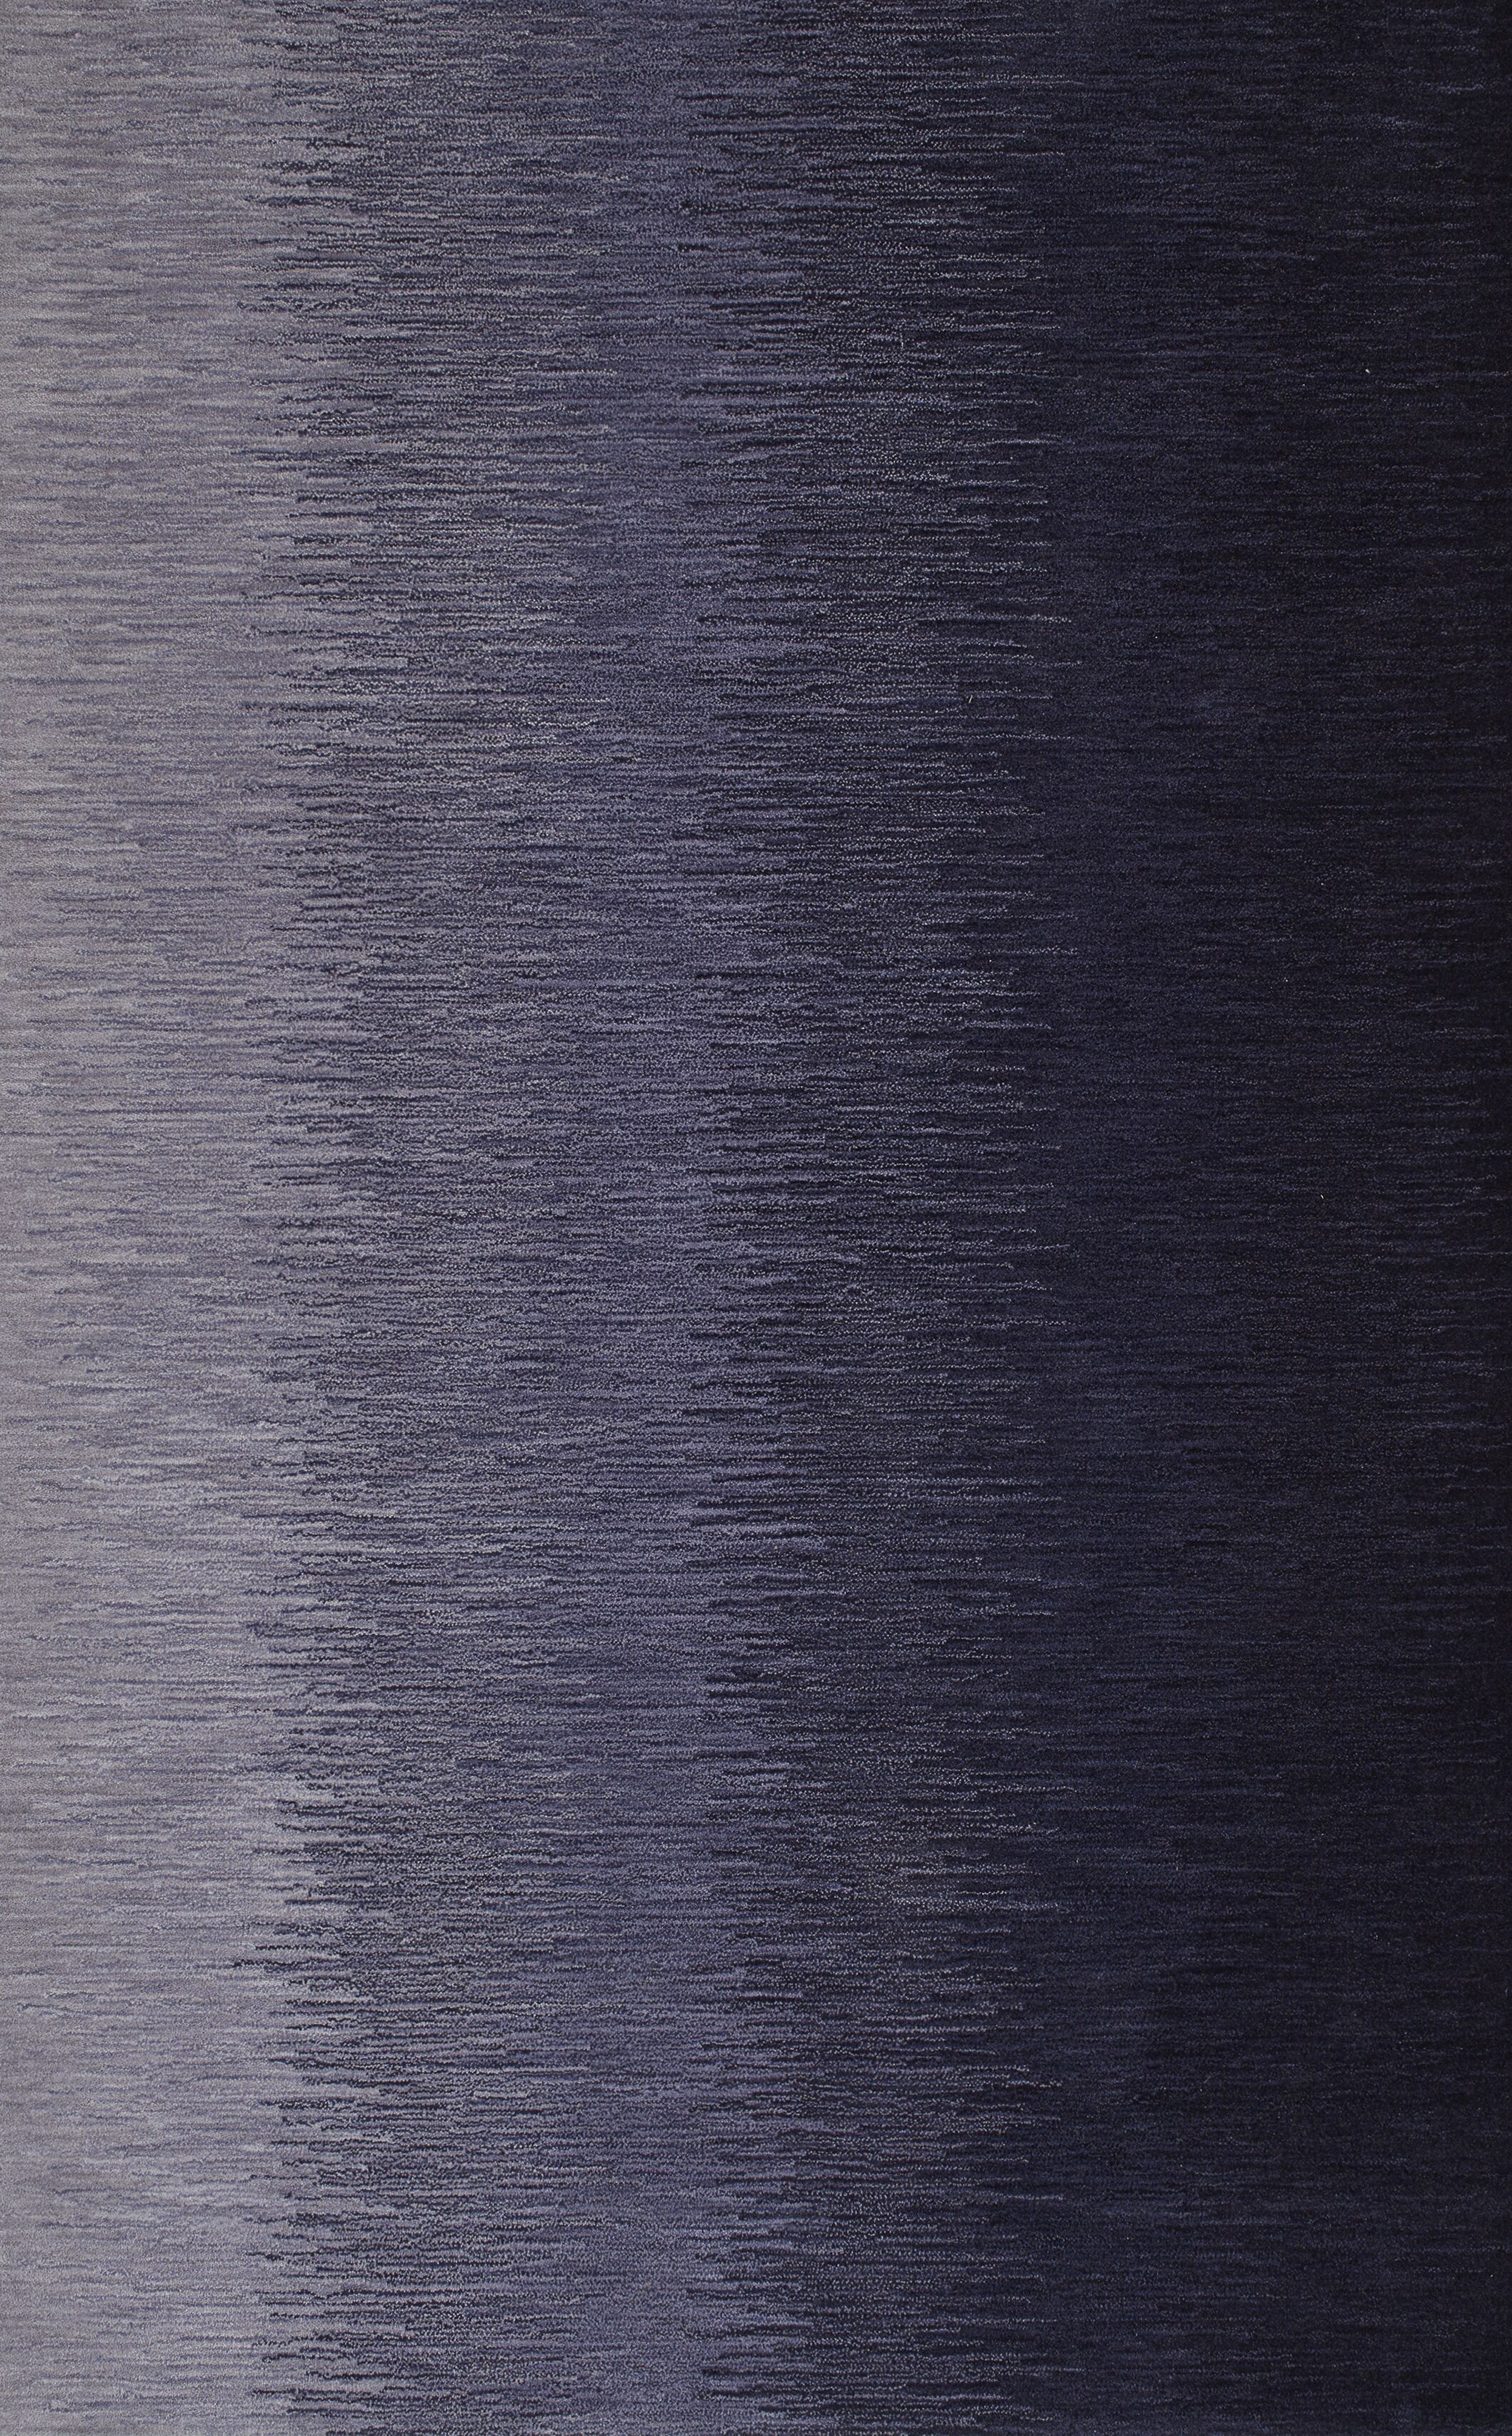 Delmar Hand-Tufted Amethyst Area Rug Rug Size: Rectangle 9' x 13'